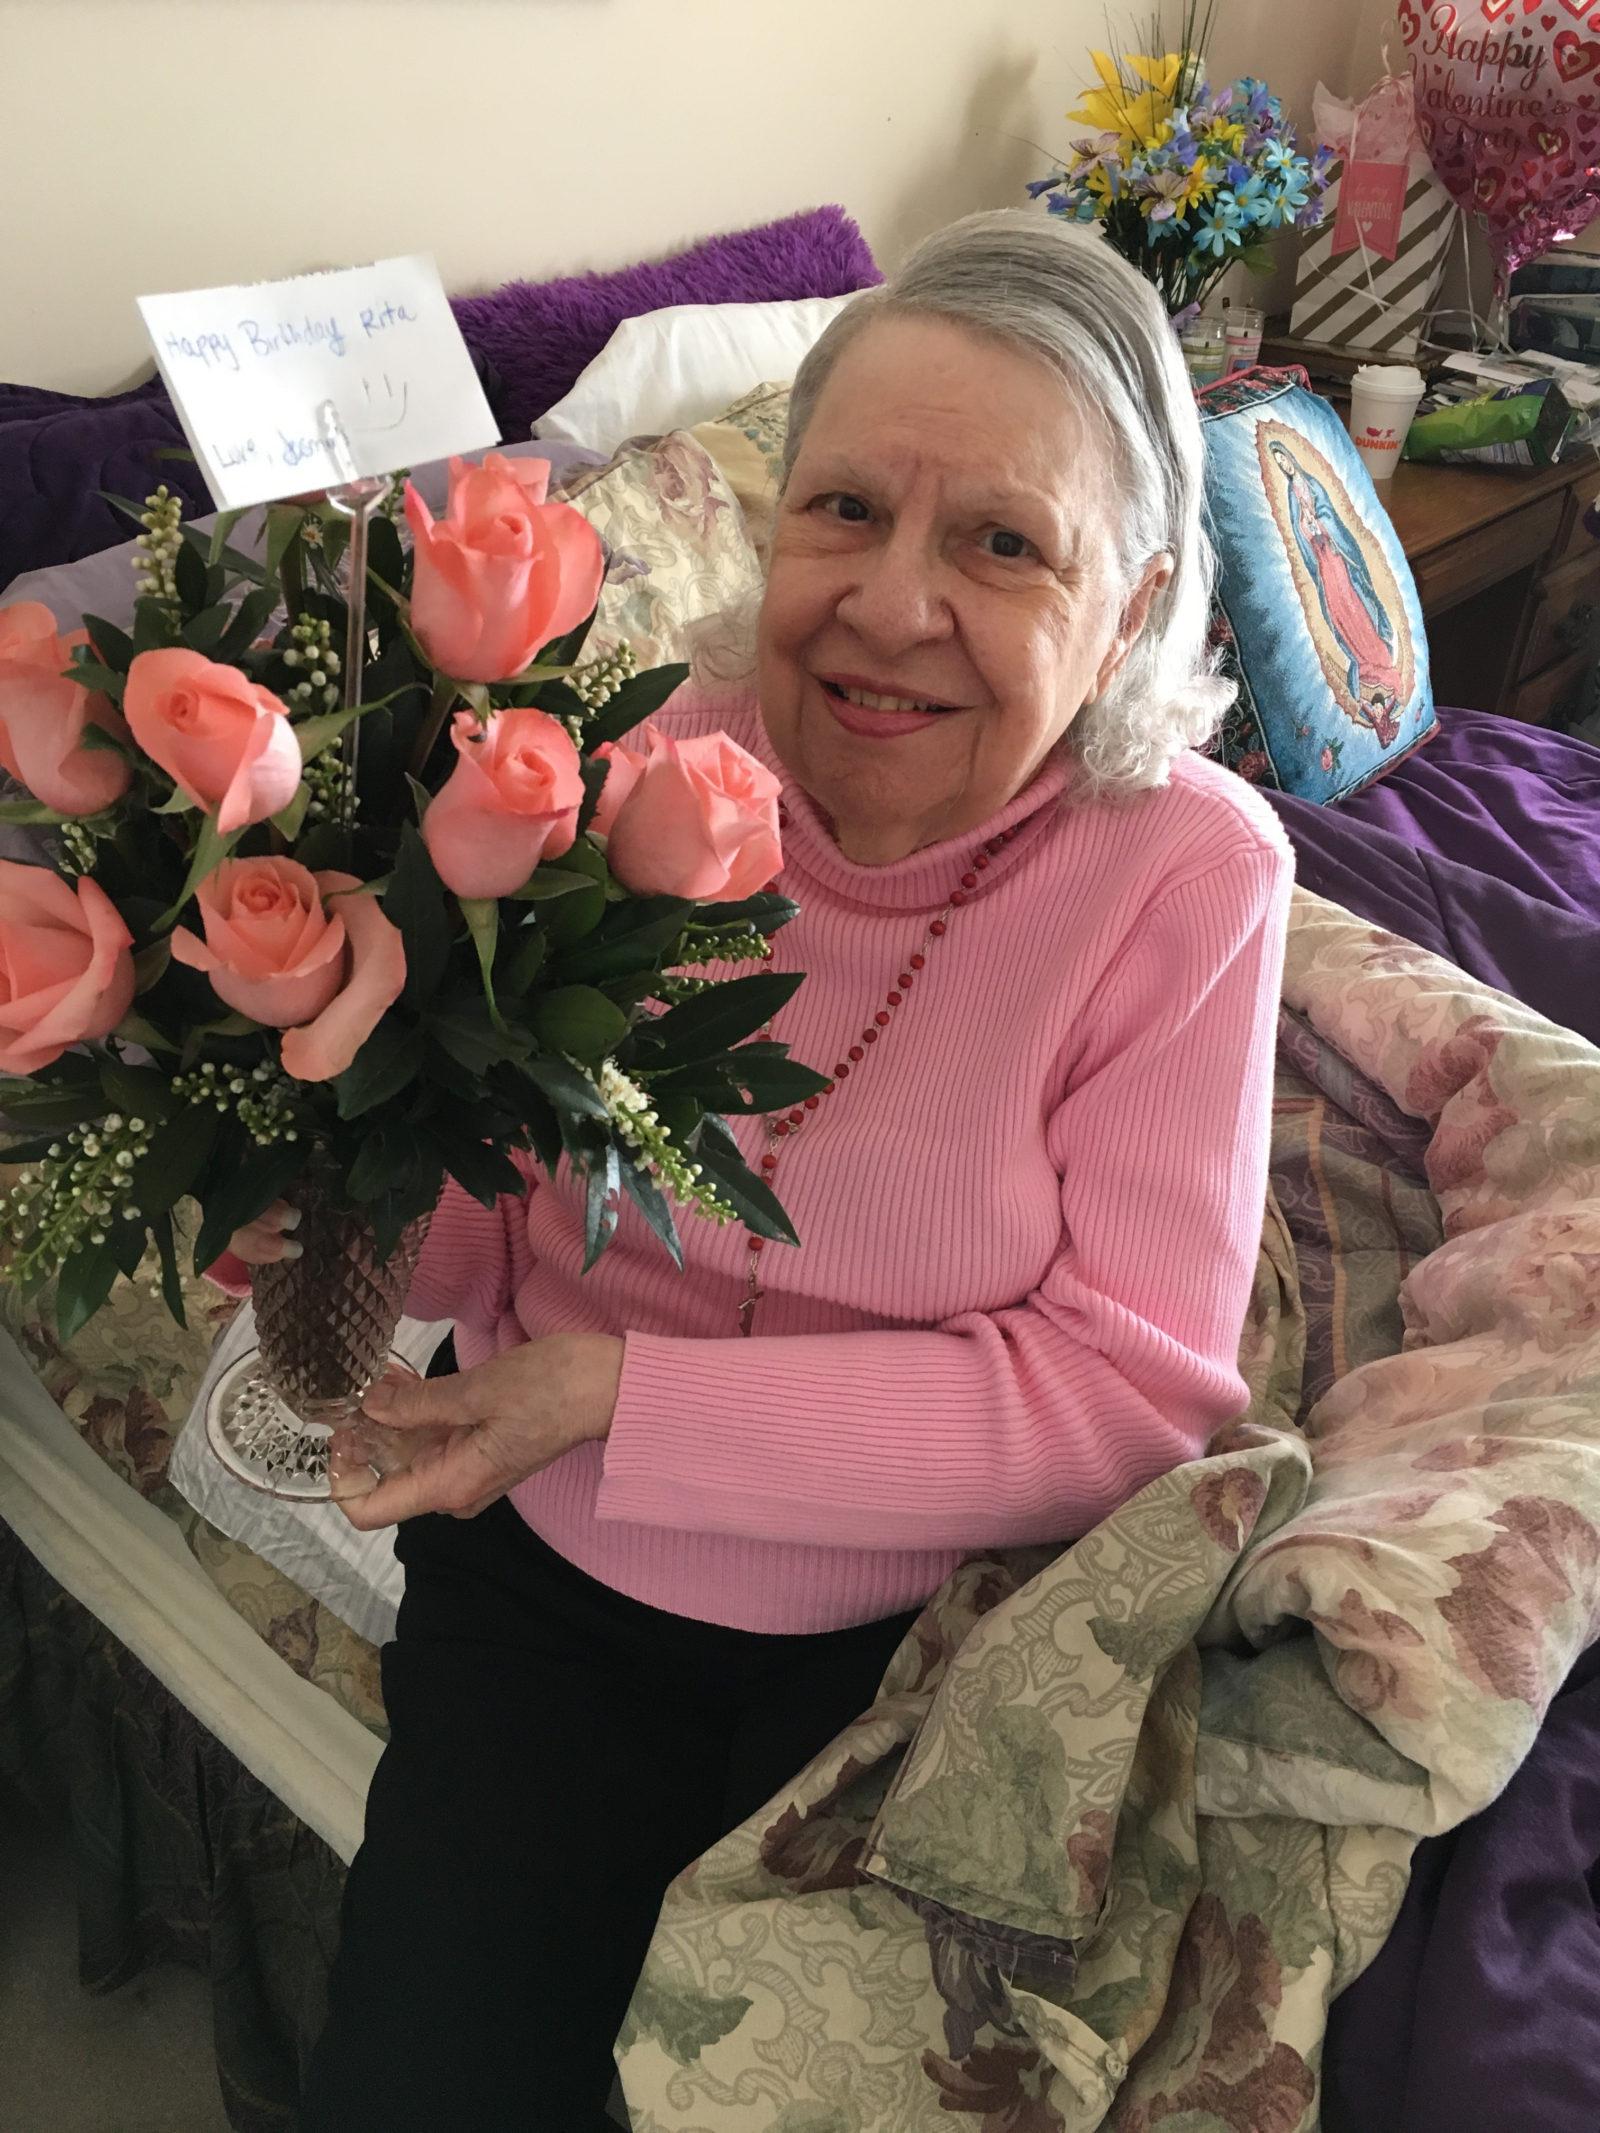 Caregiver Alpharetta GA - Happy Birthday Miss Rita